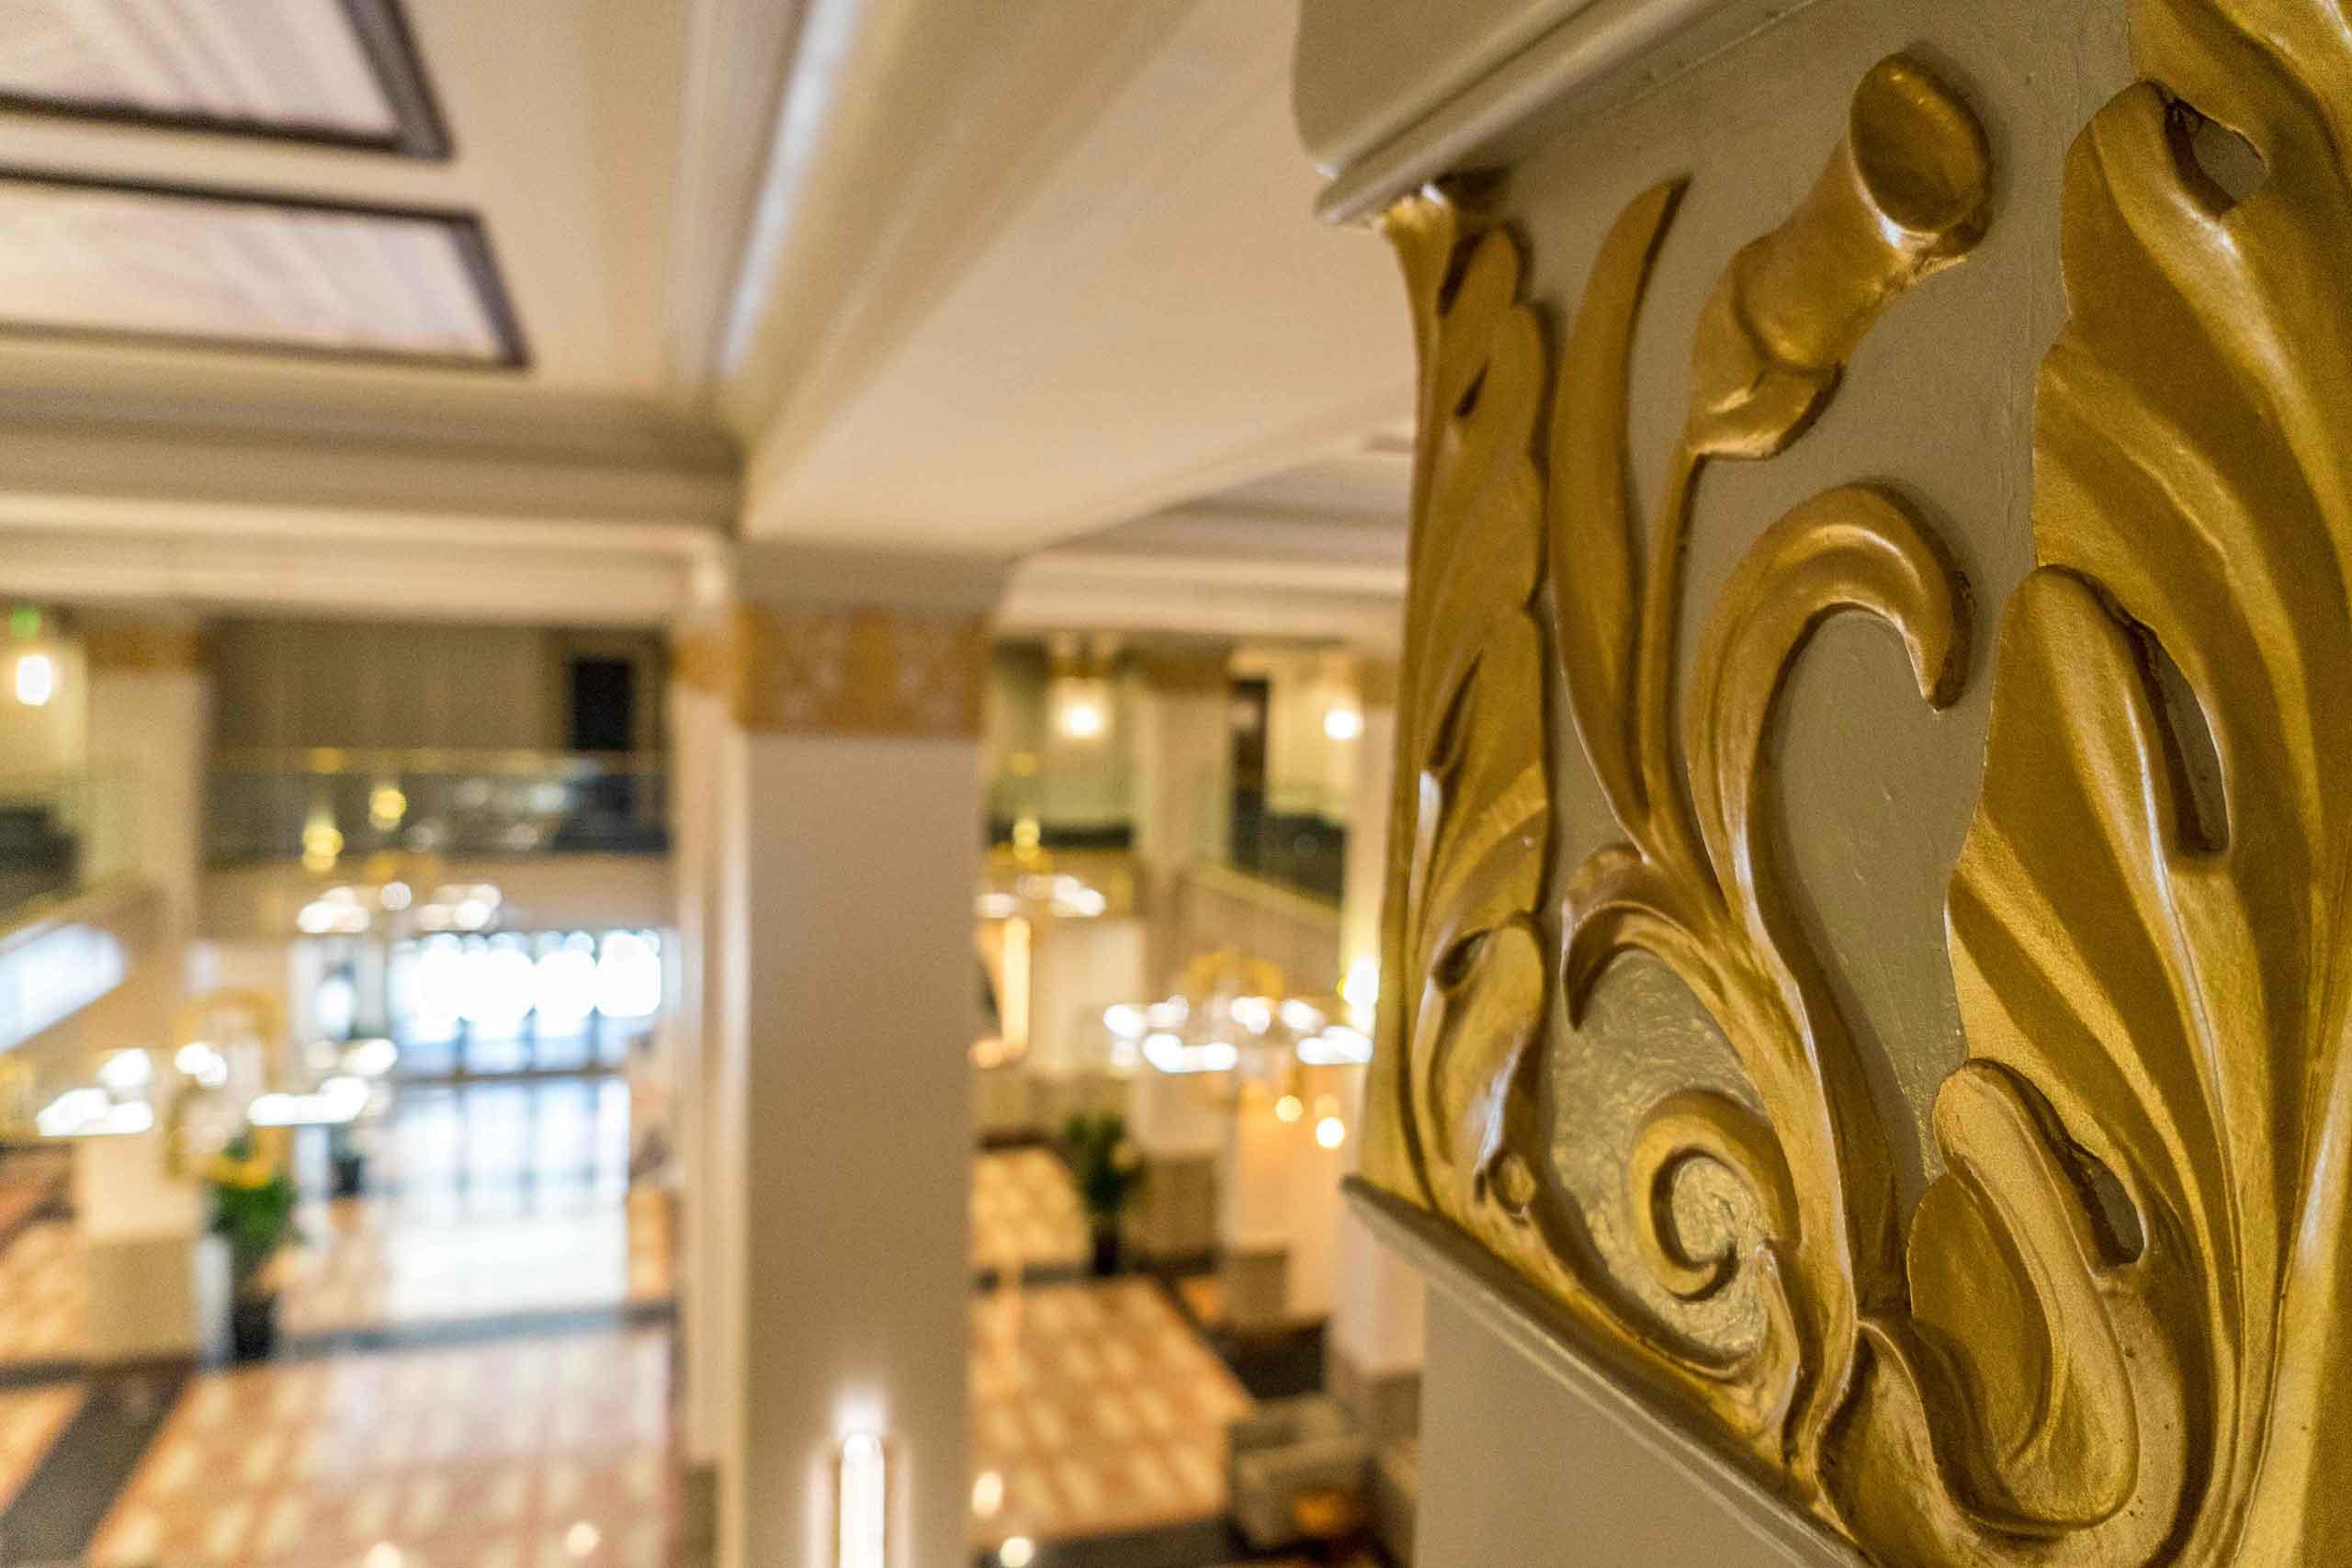 East-9-at-Pickwick-Plaza-Main-Lobby-Plaster-Molding